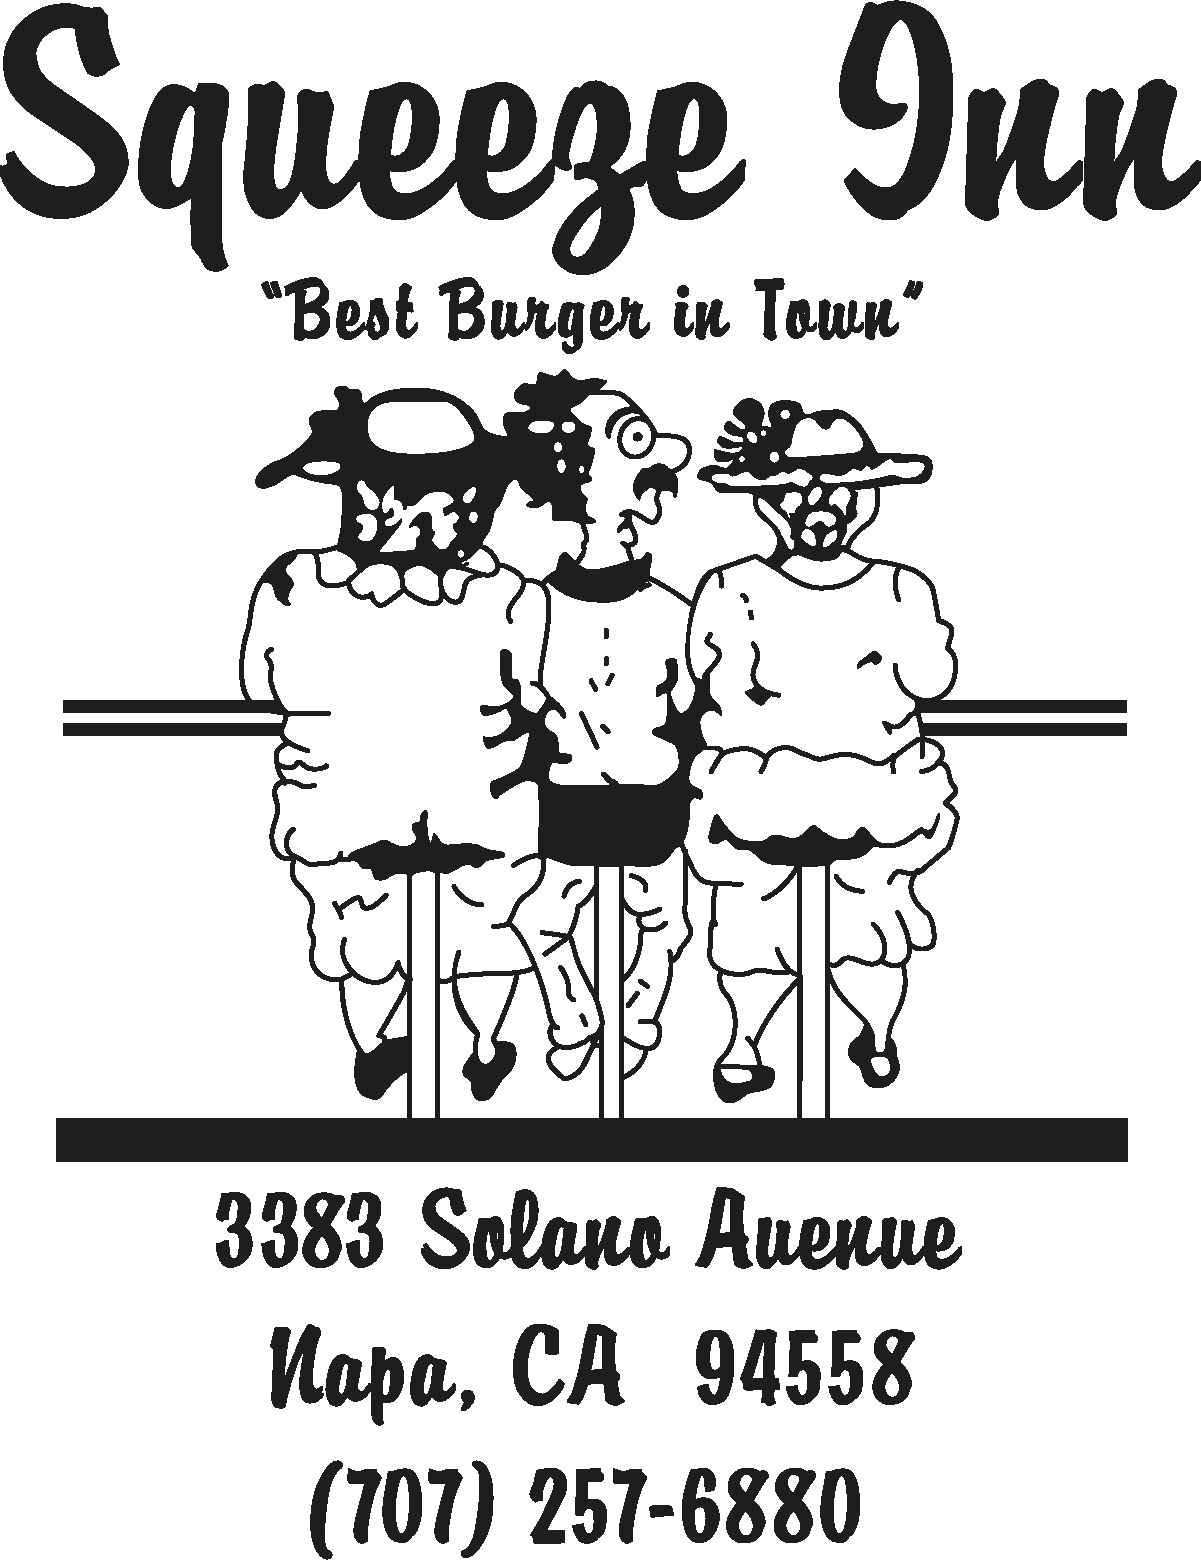 Squeeze Inn logo.png